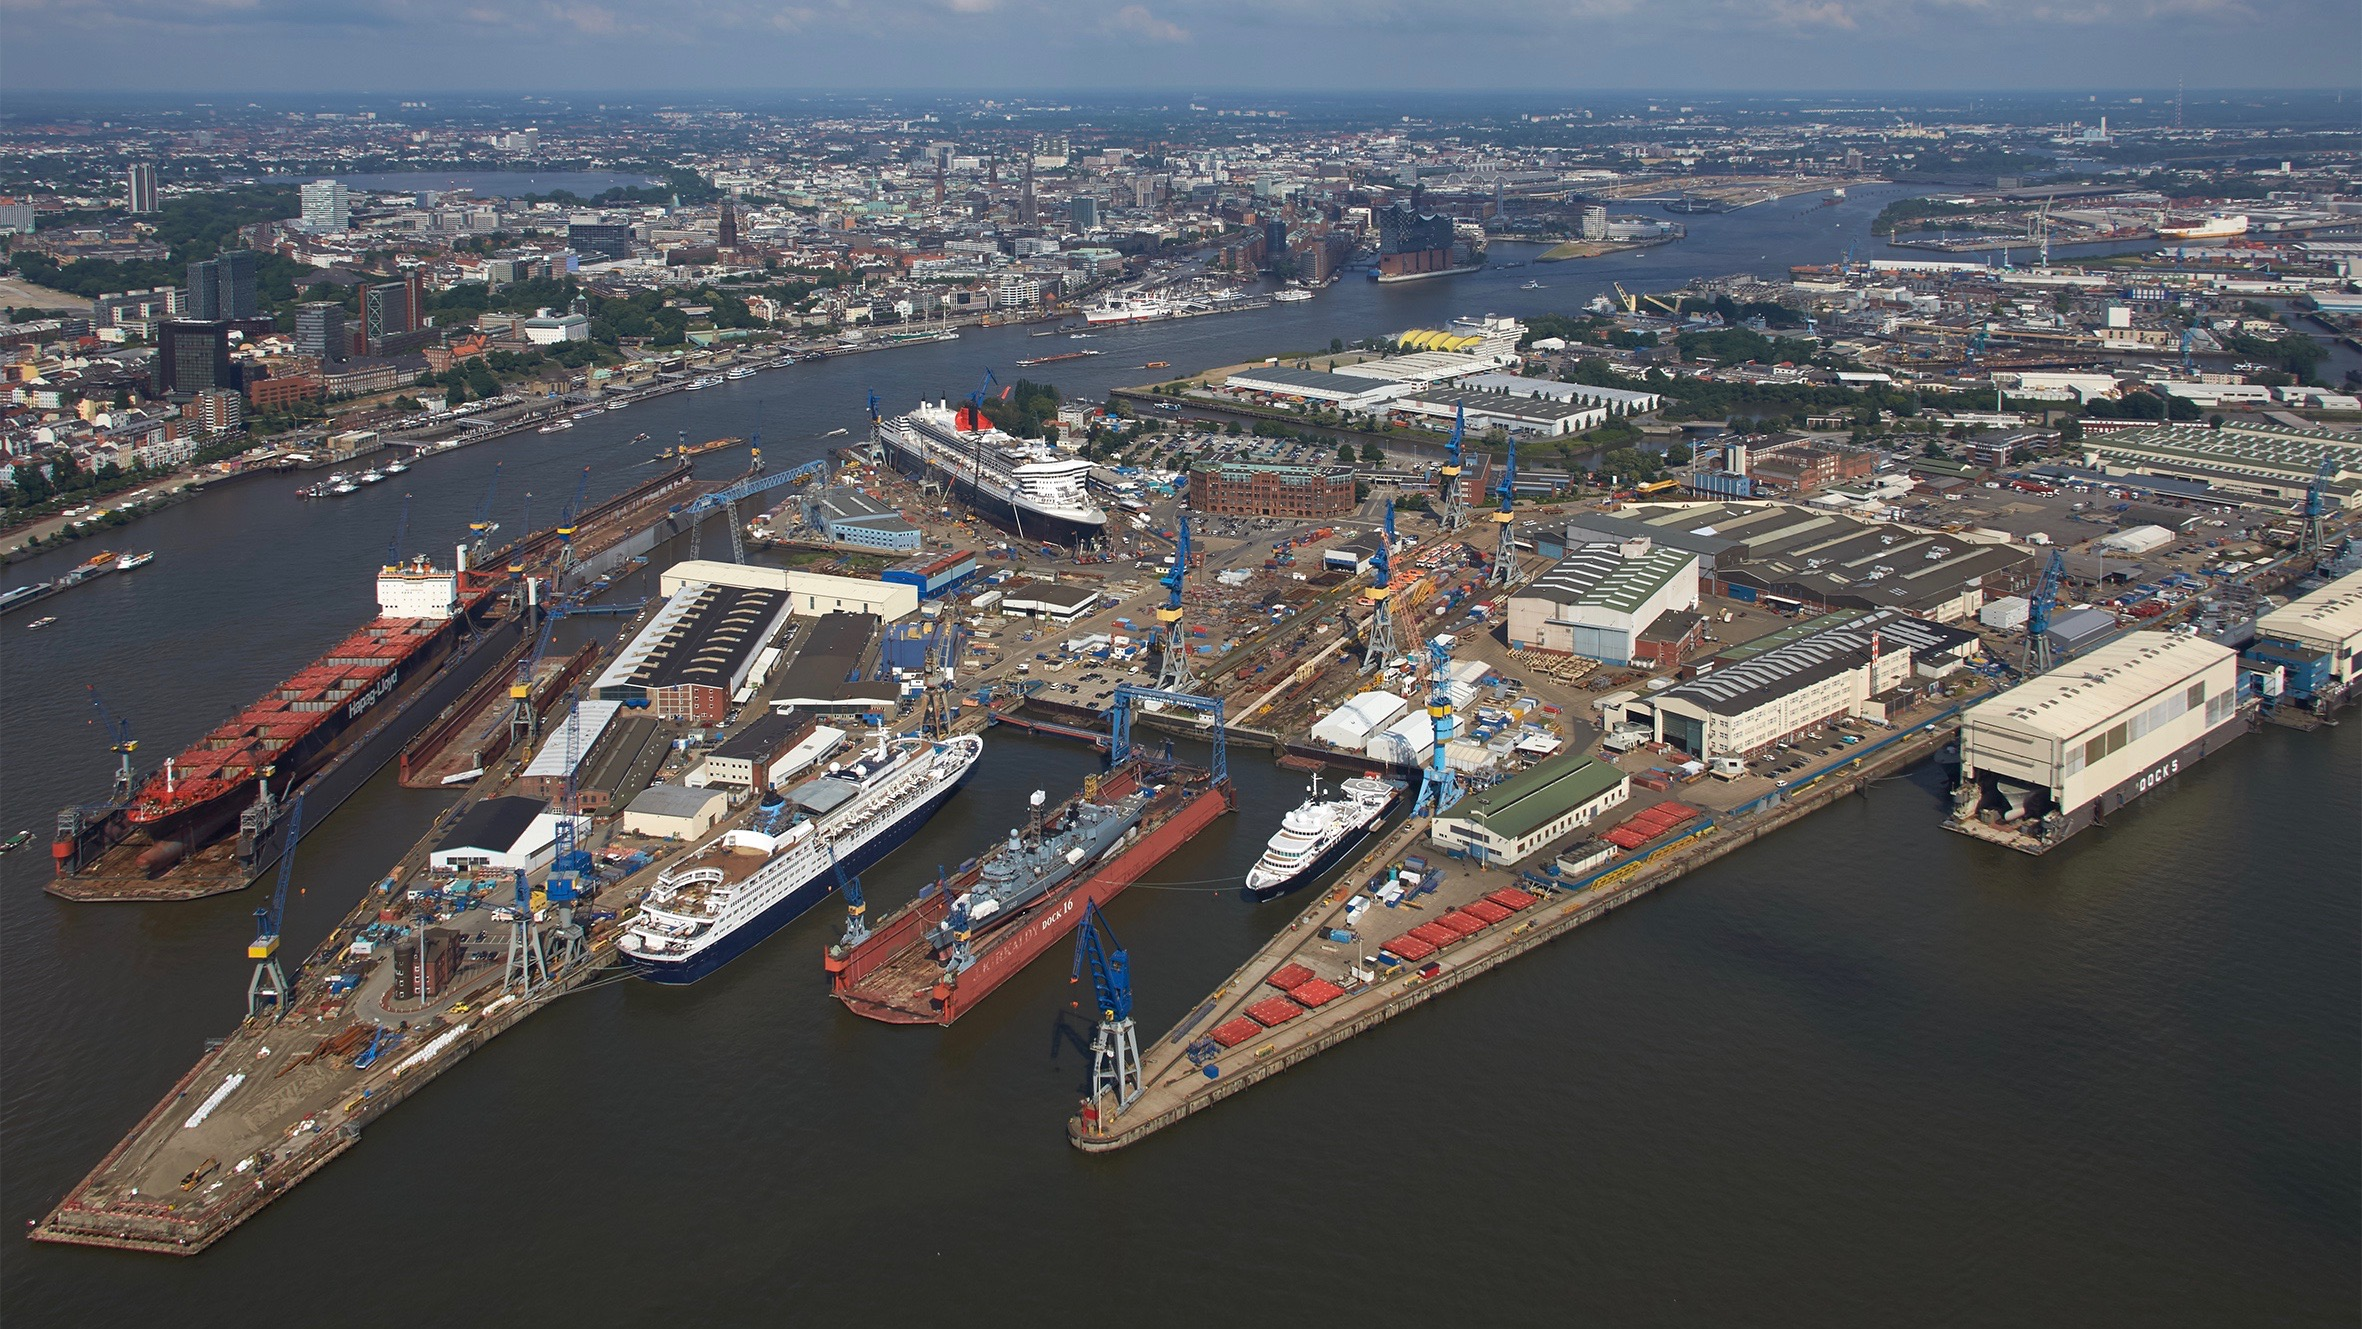 Lürssen Yacht Refit the Blohm + Voss Hamburg shipyard